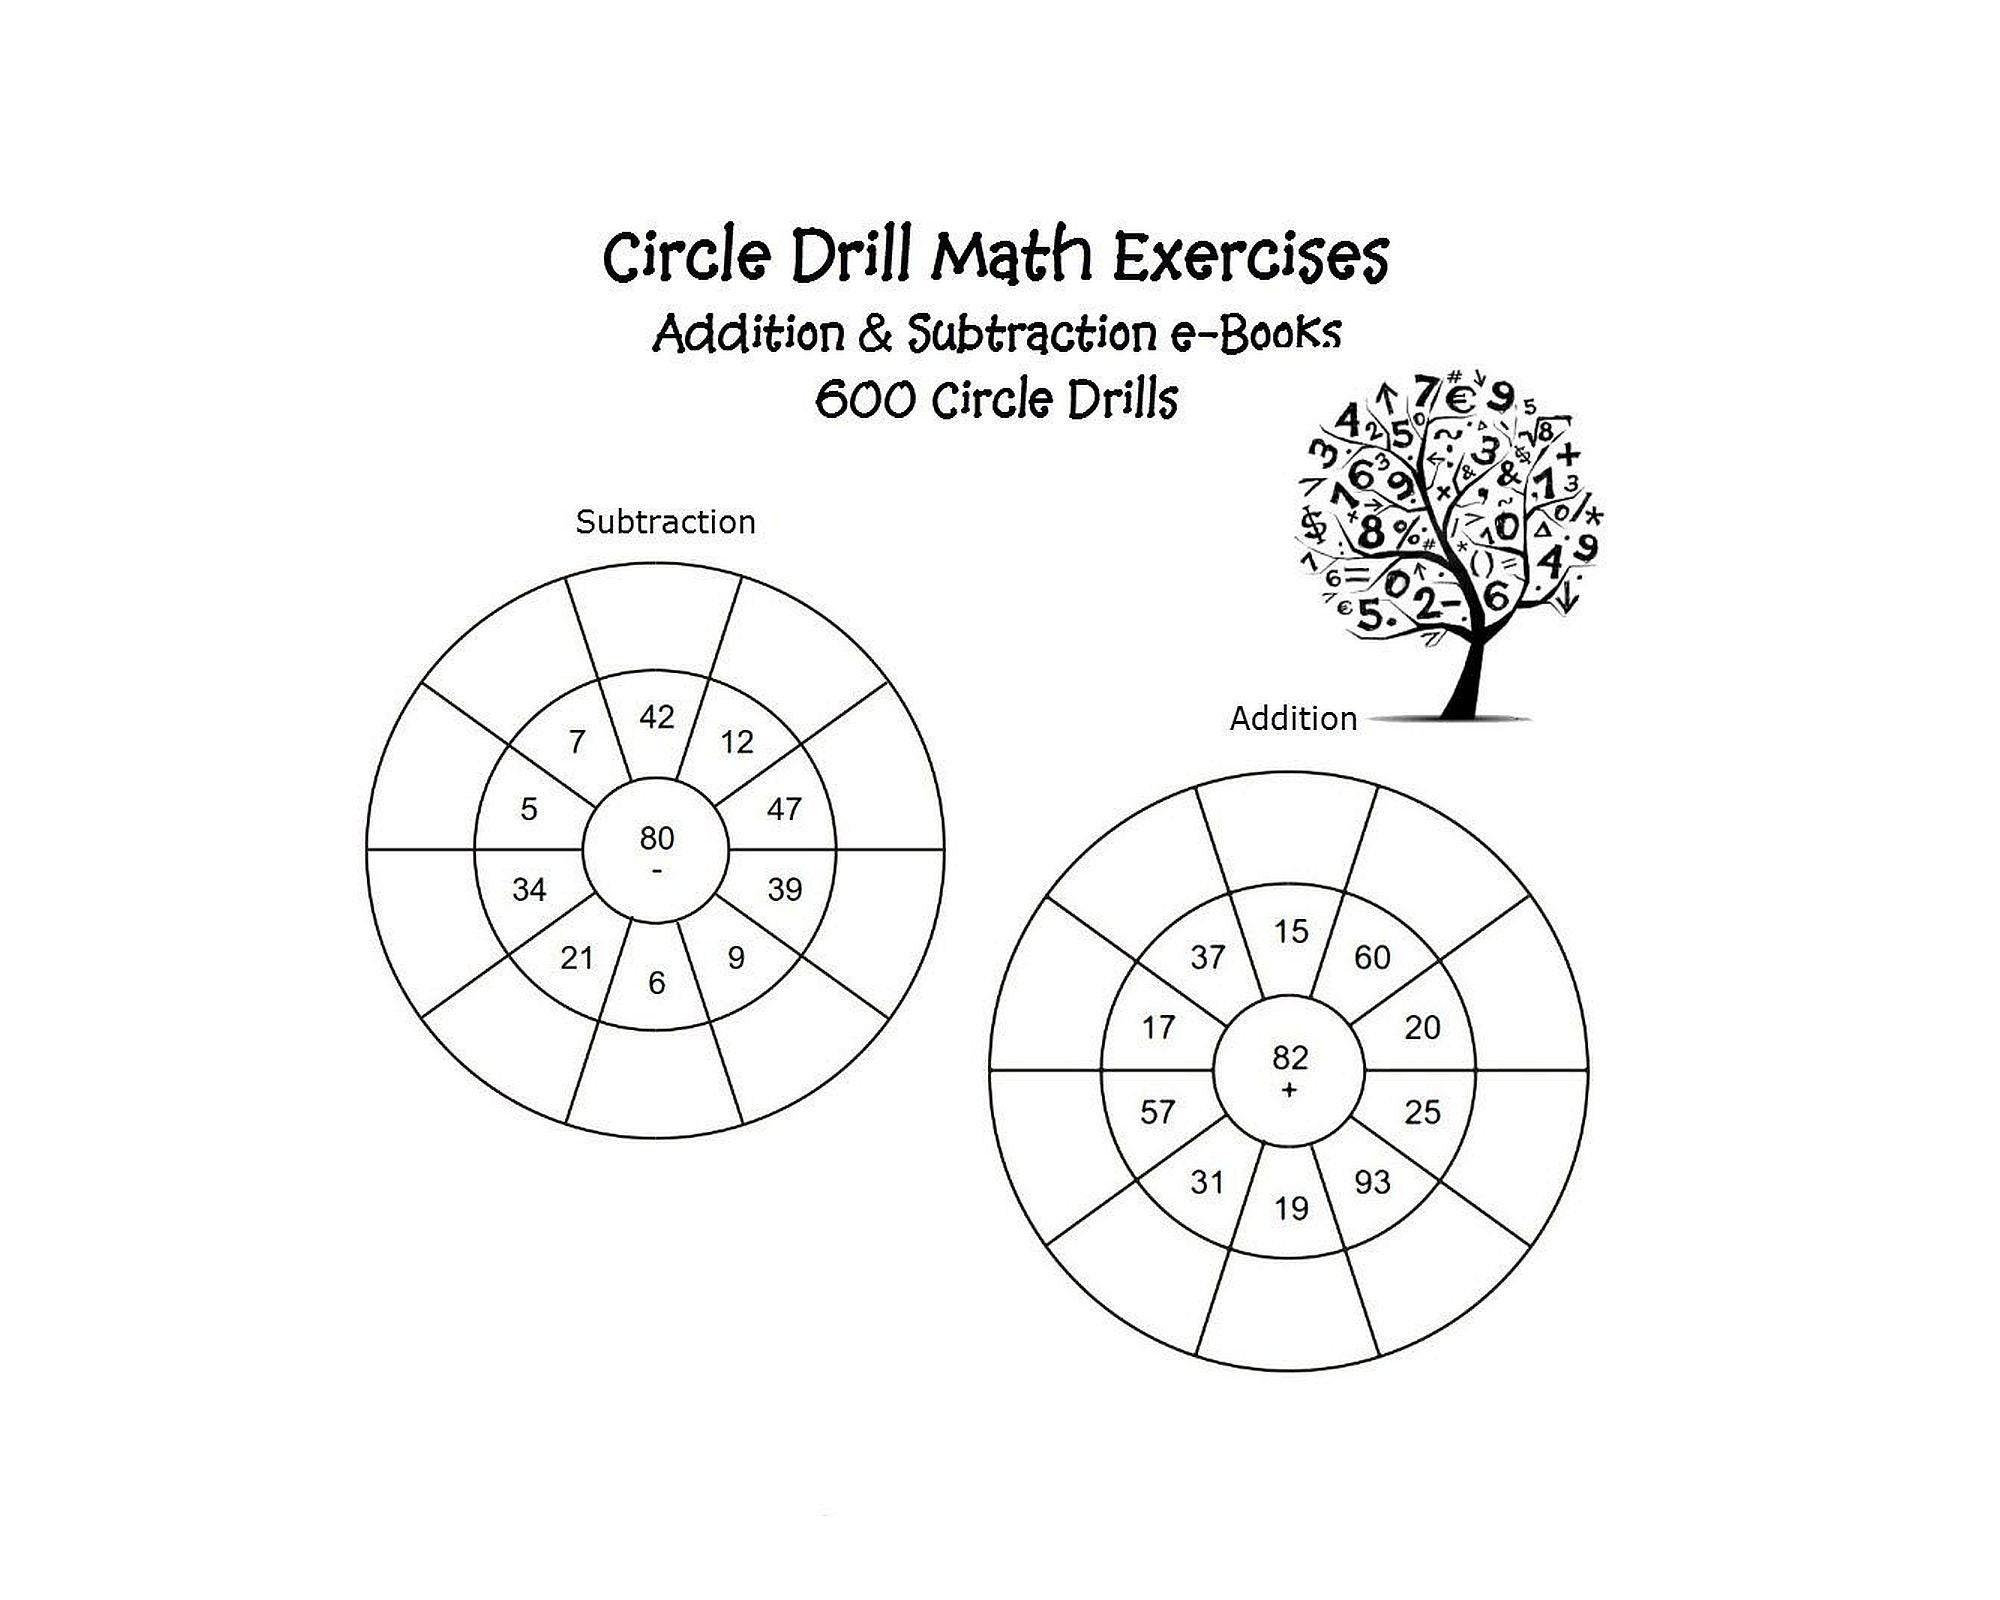 Circle Drill Math 600 Exercises Addition Subtraction Etsy Make addition circle drill